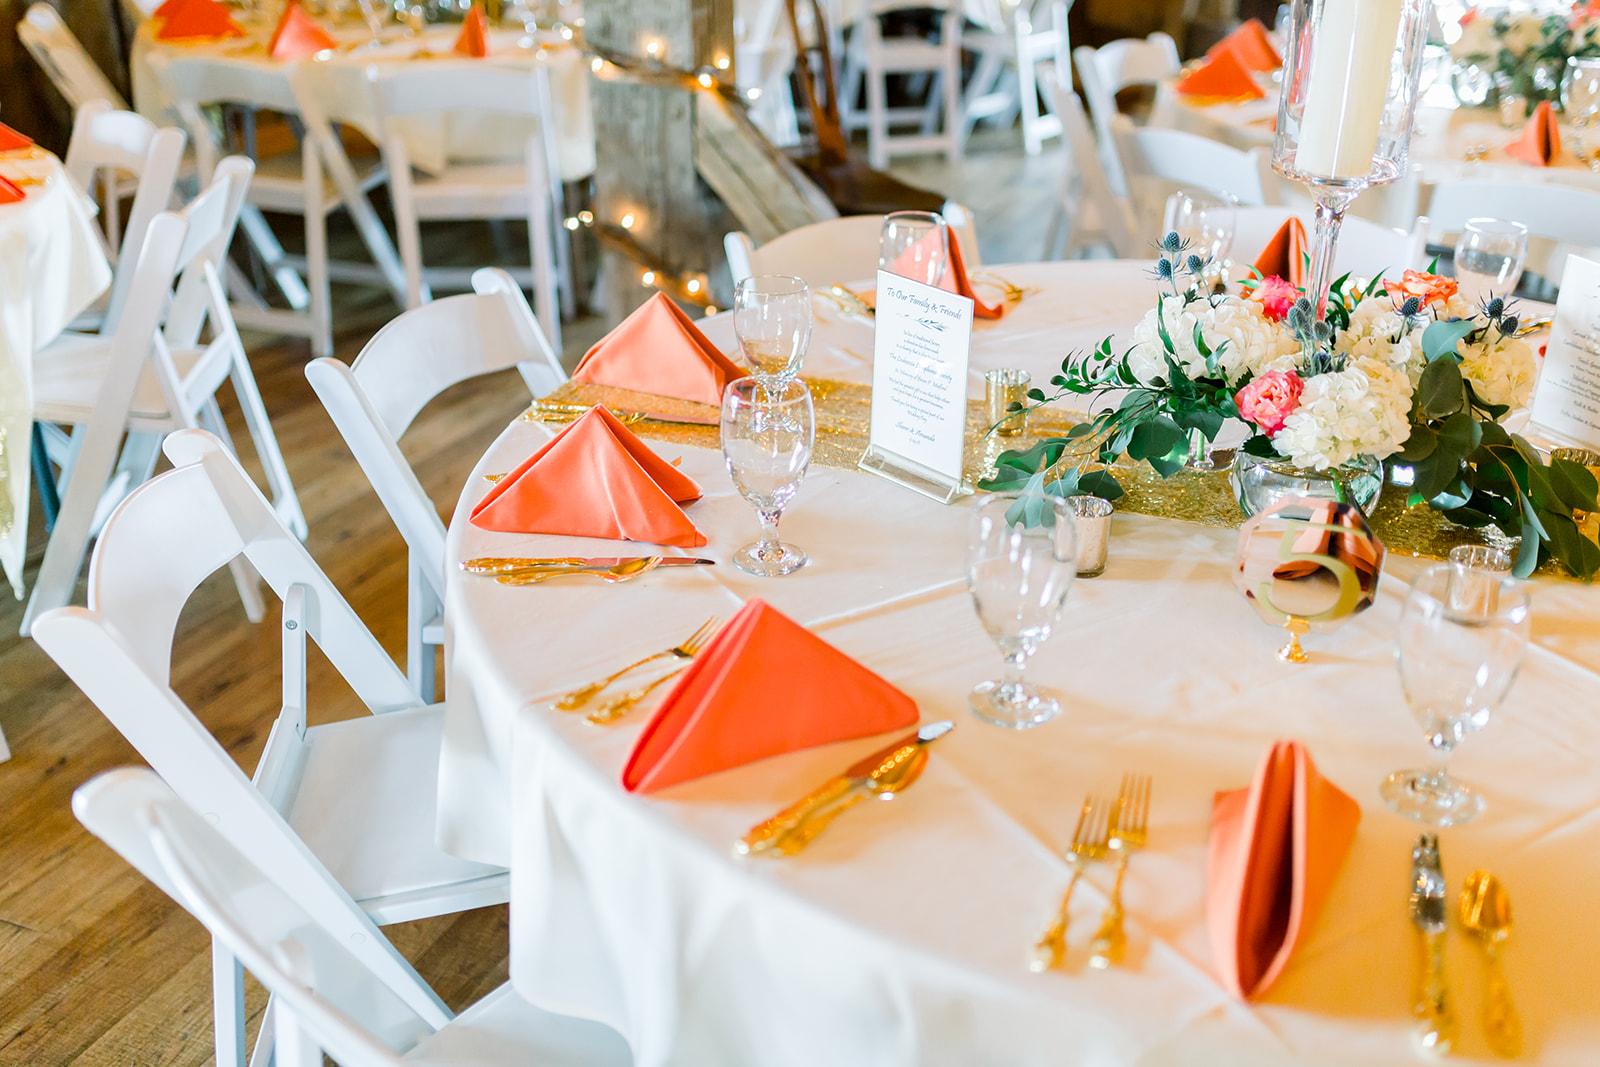 Armstrong Farms Rustic Barn Wedding Table Setting_Krystal Healy Photography.jpg